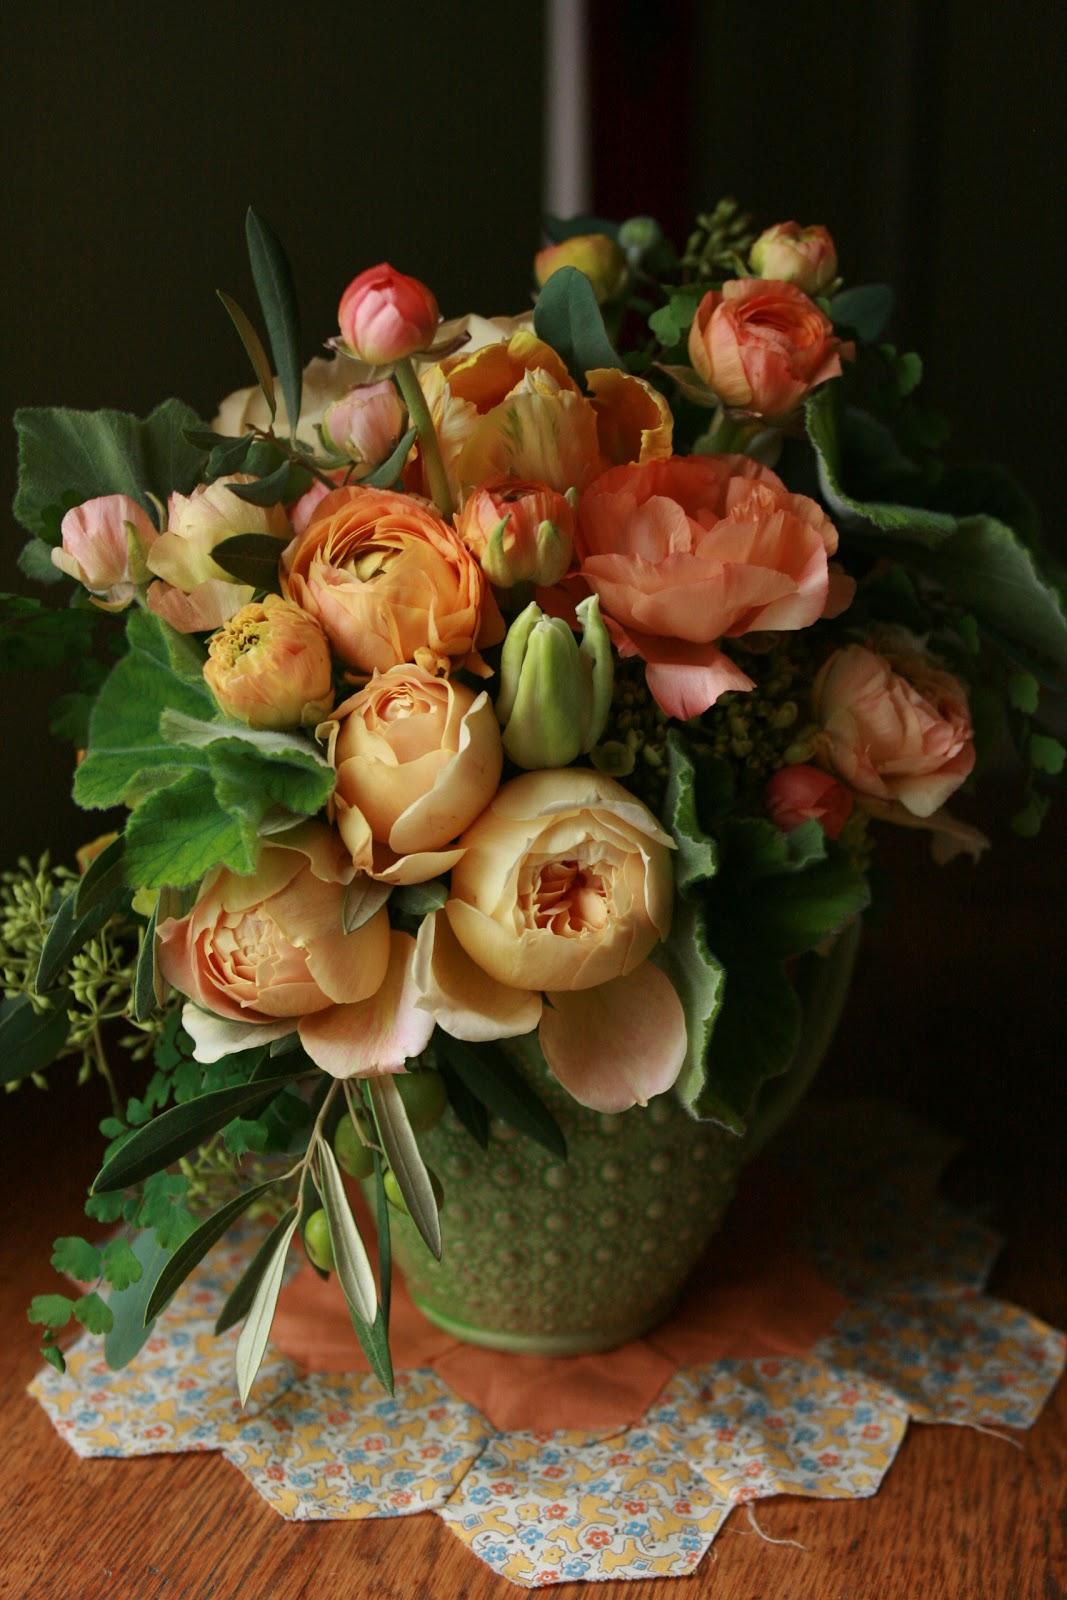 Repurposing Floret Flowers